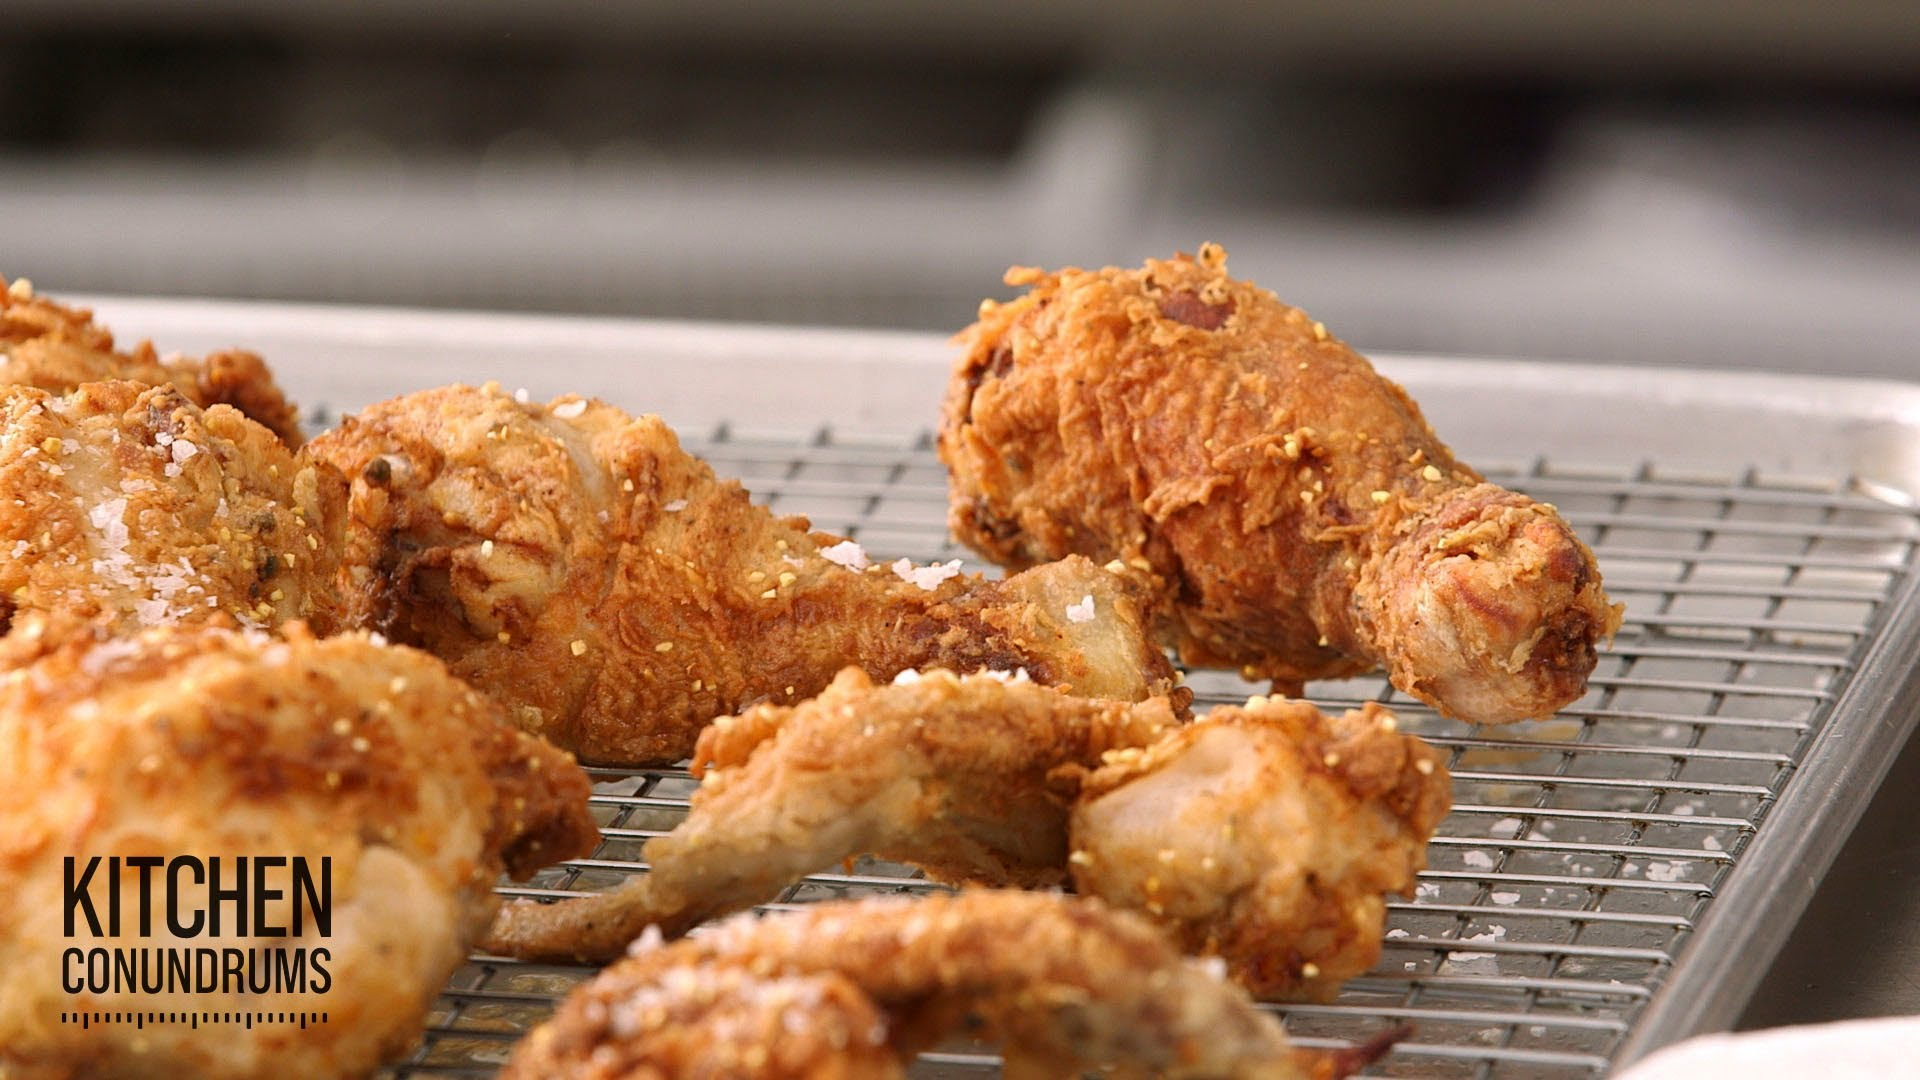 「FRIDAY NIGHT!!! 為您送上讓人無法抵抗的炸雞食譜」- No-Fail Deep-Fried Chicken